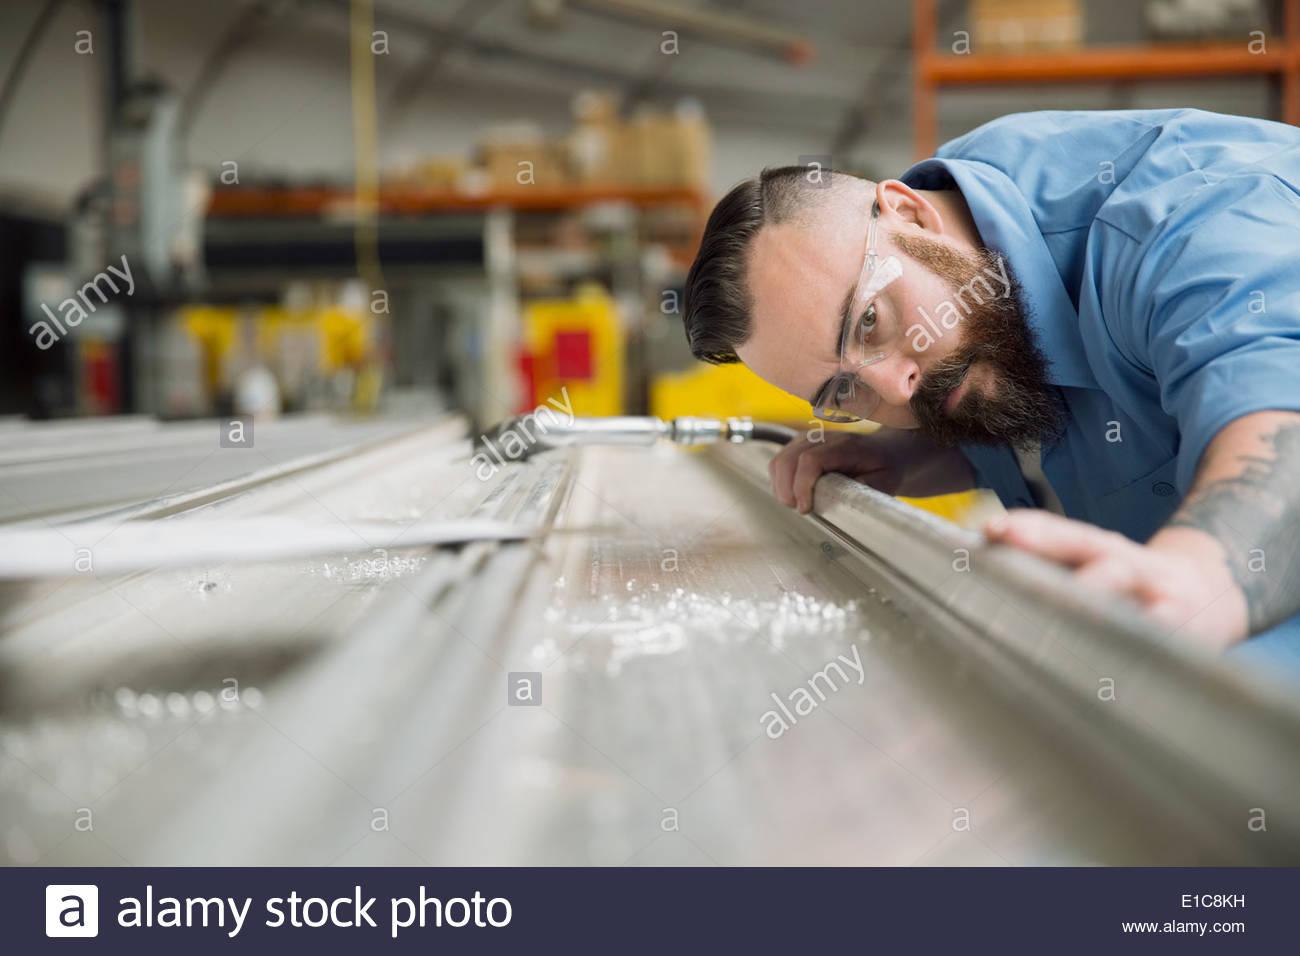 Worker examining sheet metal in manufacturing plant - Stock Image